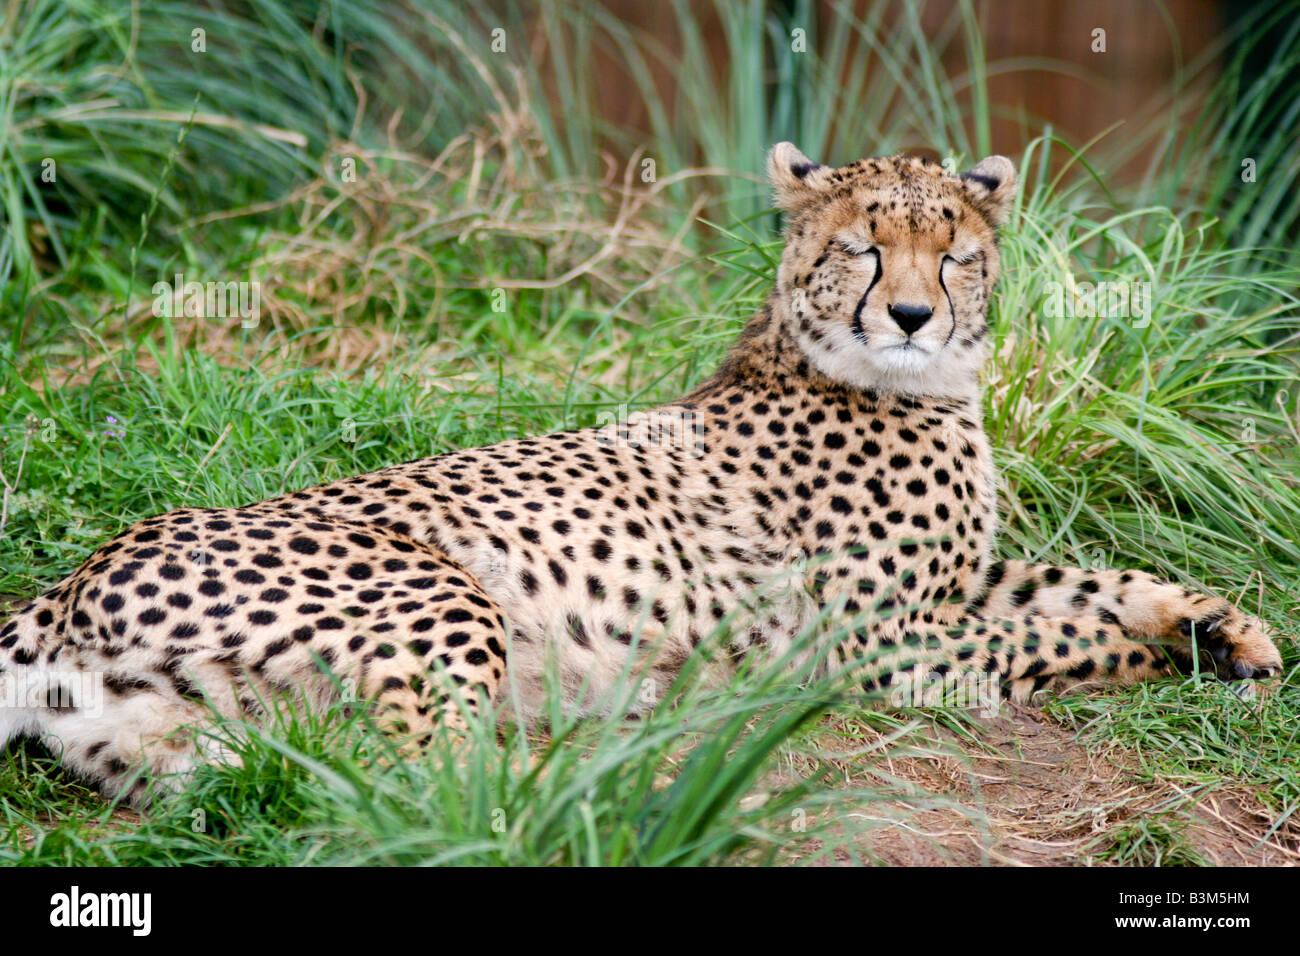 cheetah sleeping stock photos cheetah sleeping stock images alamy